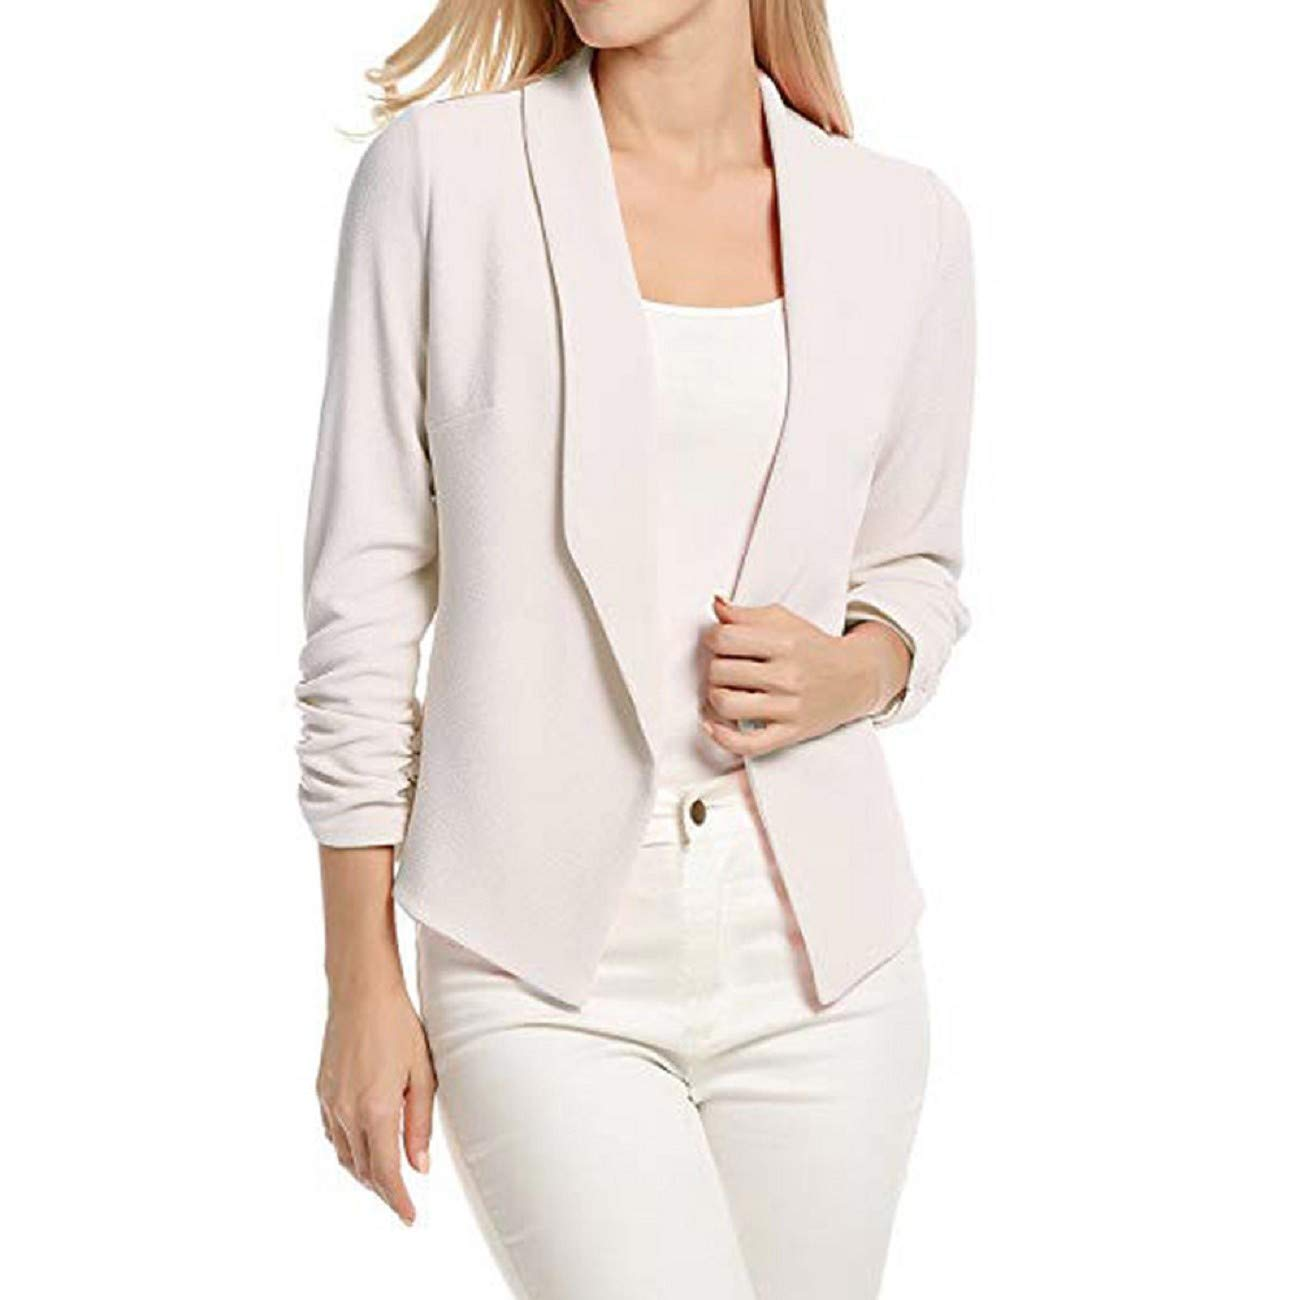 Adreamess Women 3//4 Sleeve Blazer Open Front Short Cardigan Suit Jacket Work Office Ladies Business Coat Outwear